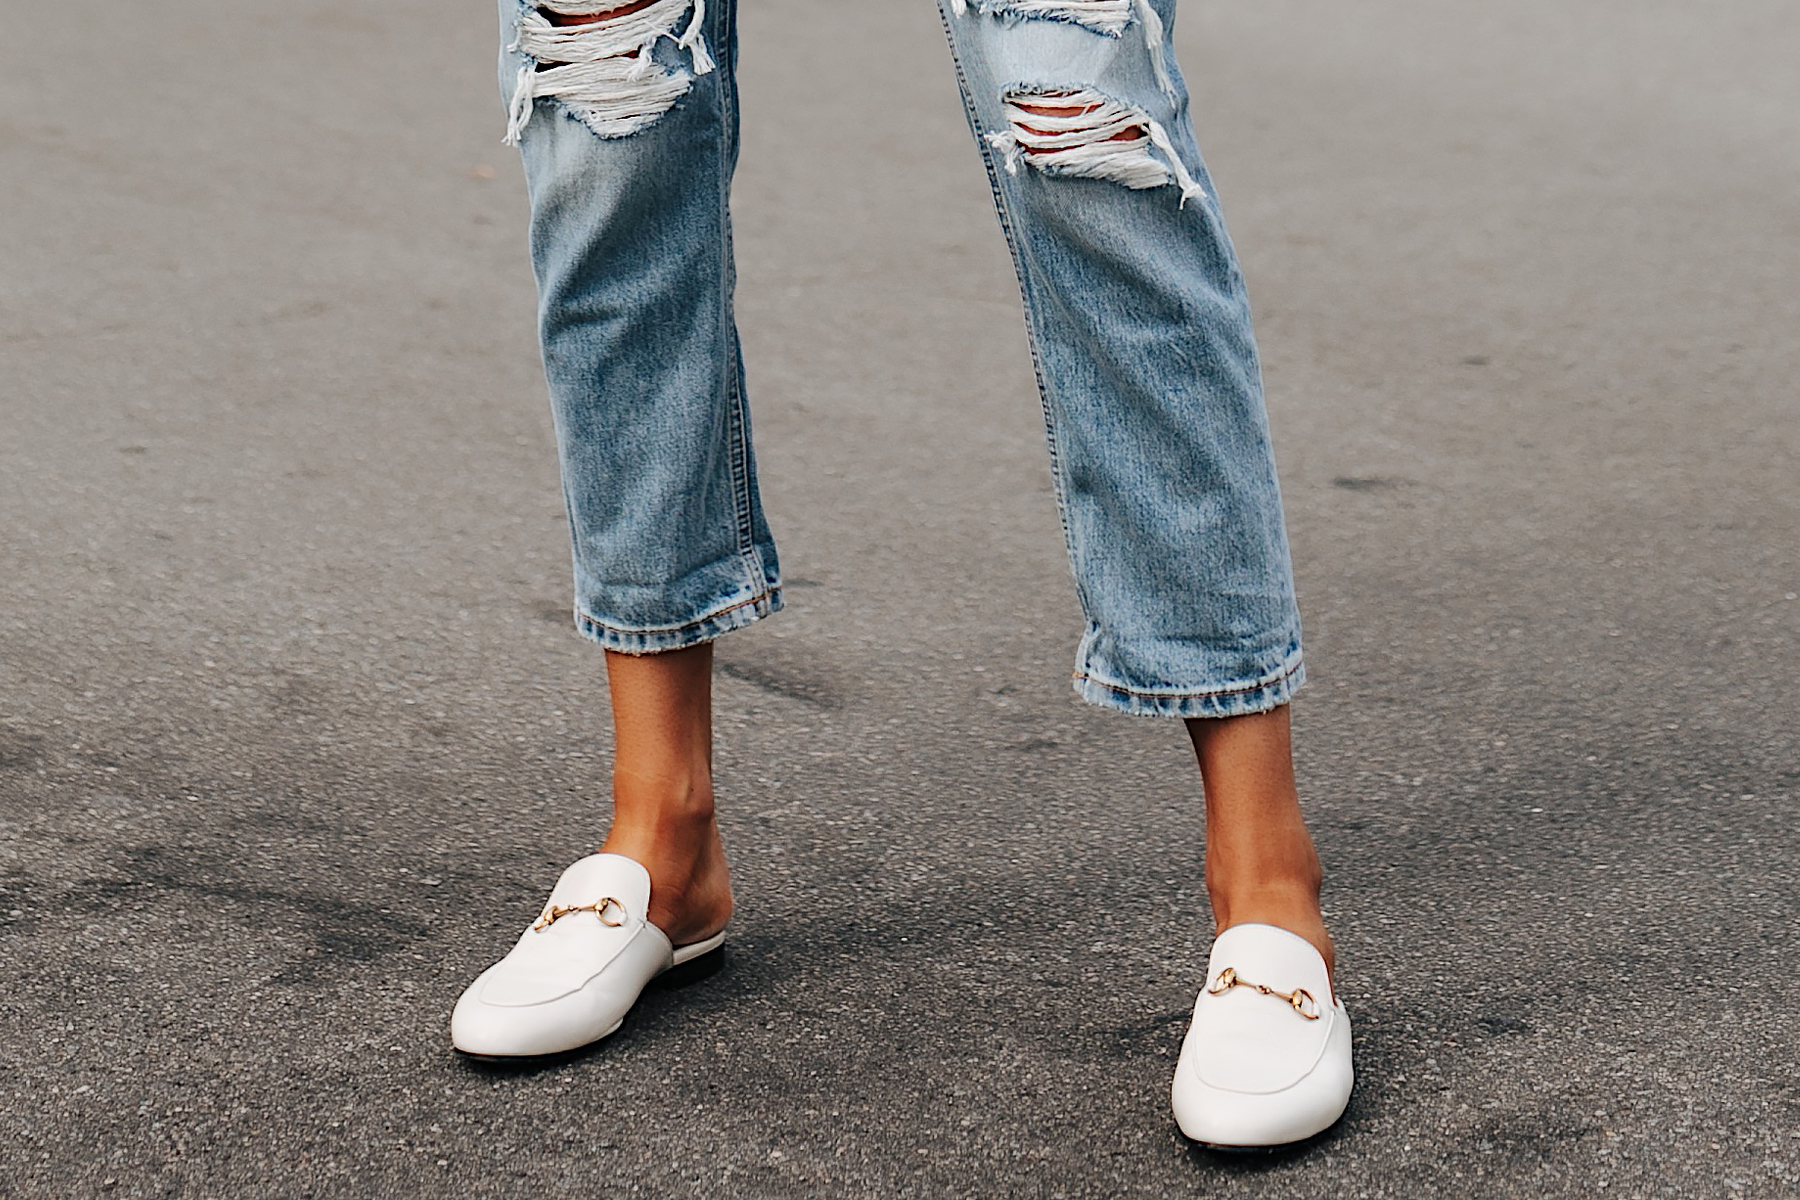 Fashion Jackson Wearing Everlane Ripped Boyfriend Jeans Gucci Princetown White Mules 2